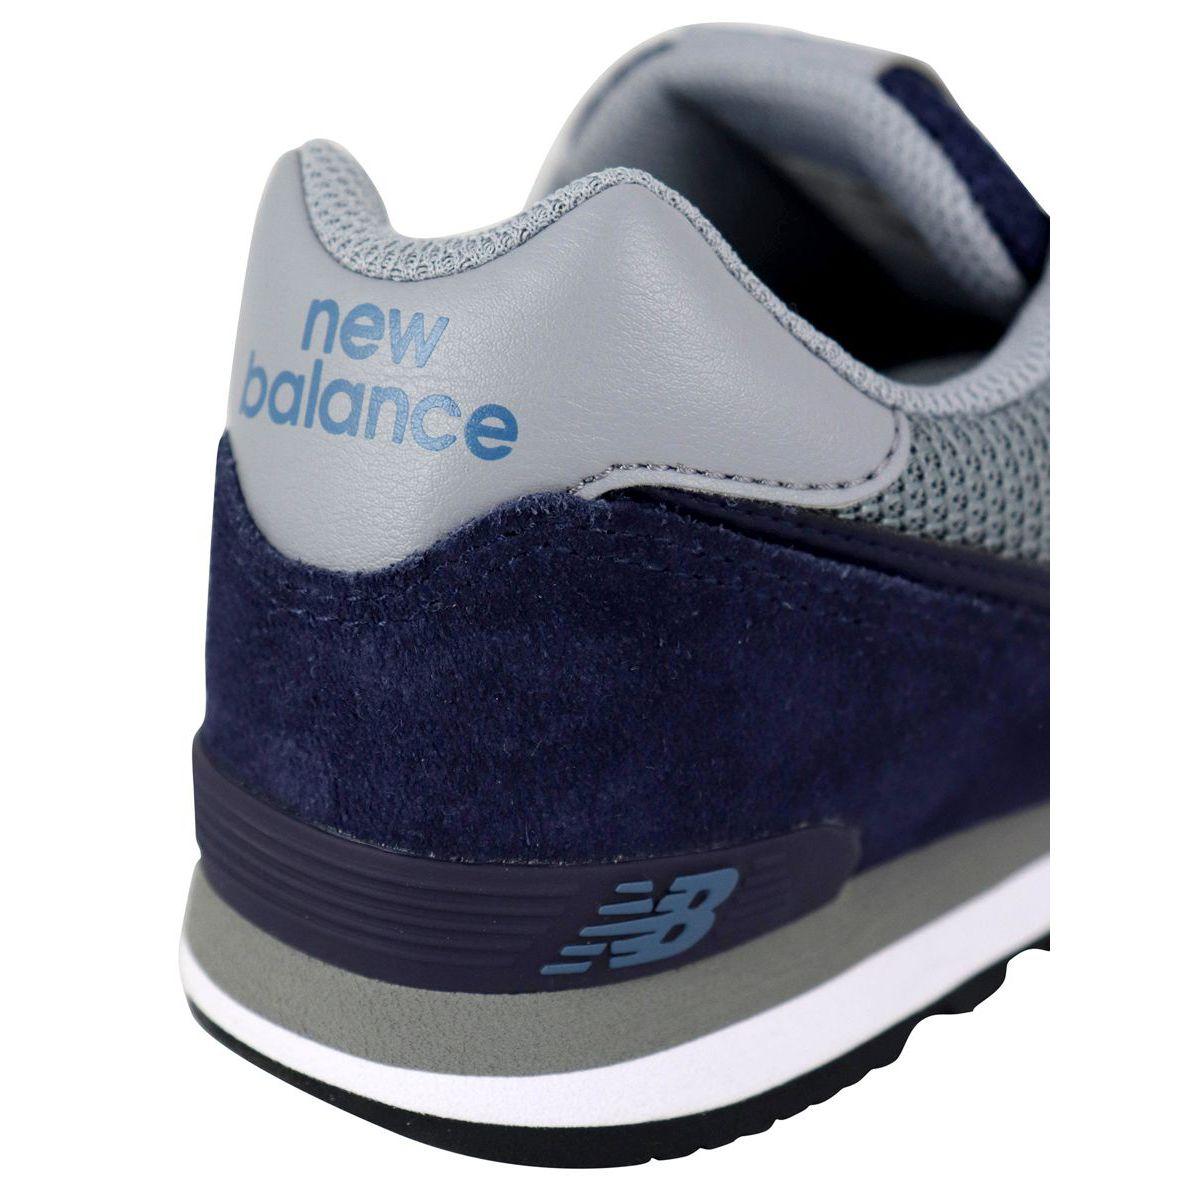 new balance 38 ragazzo